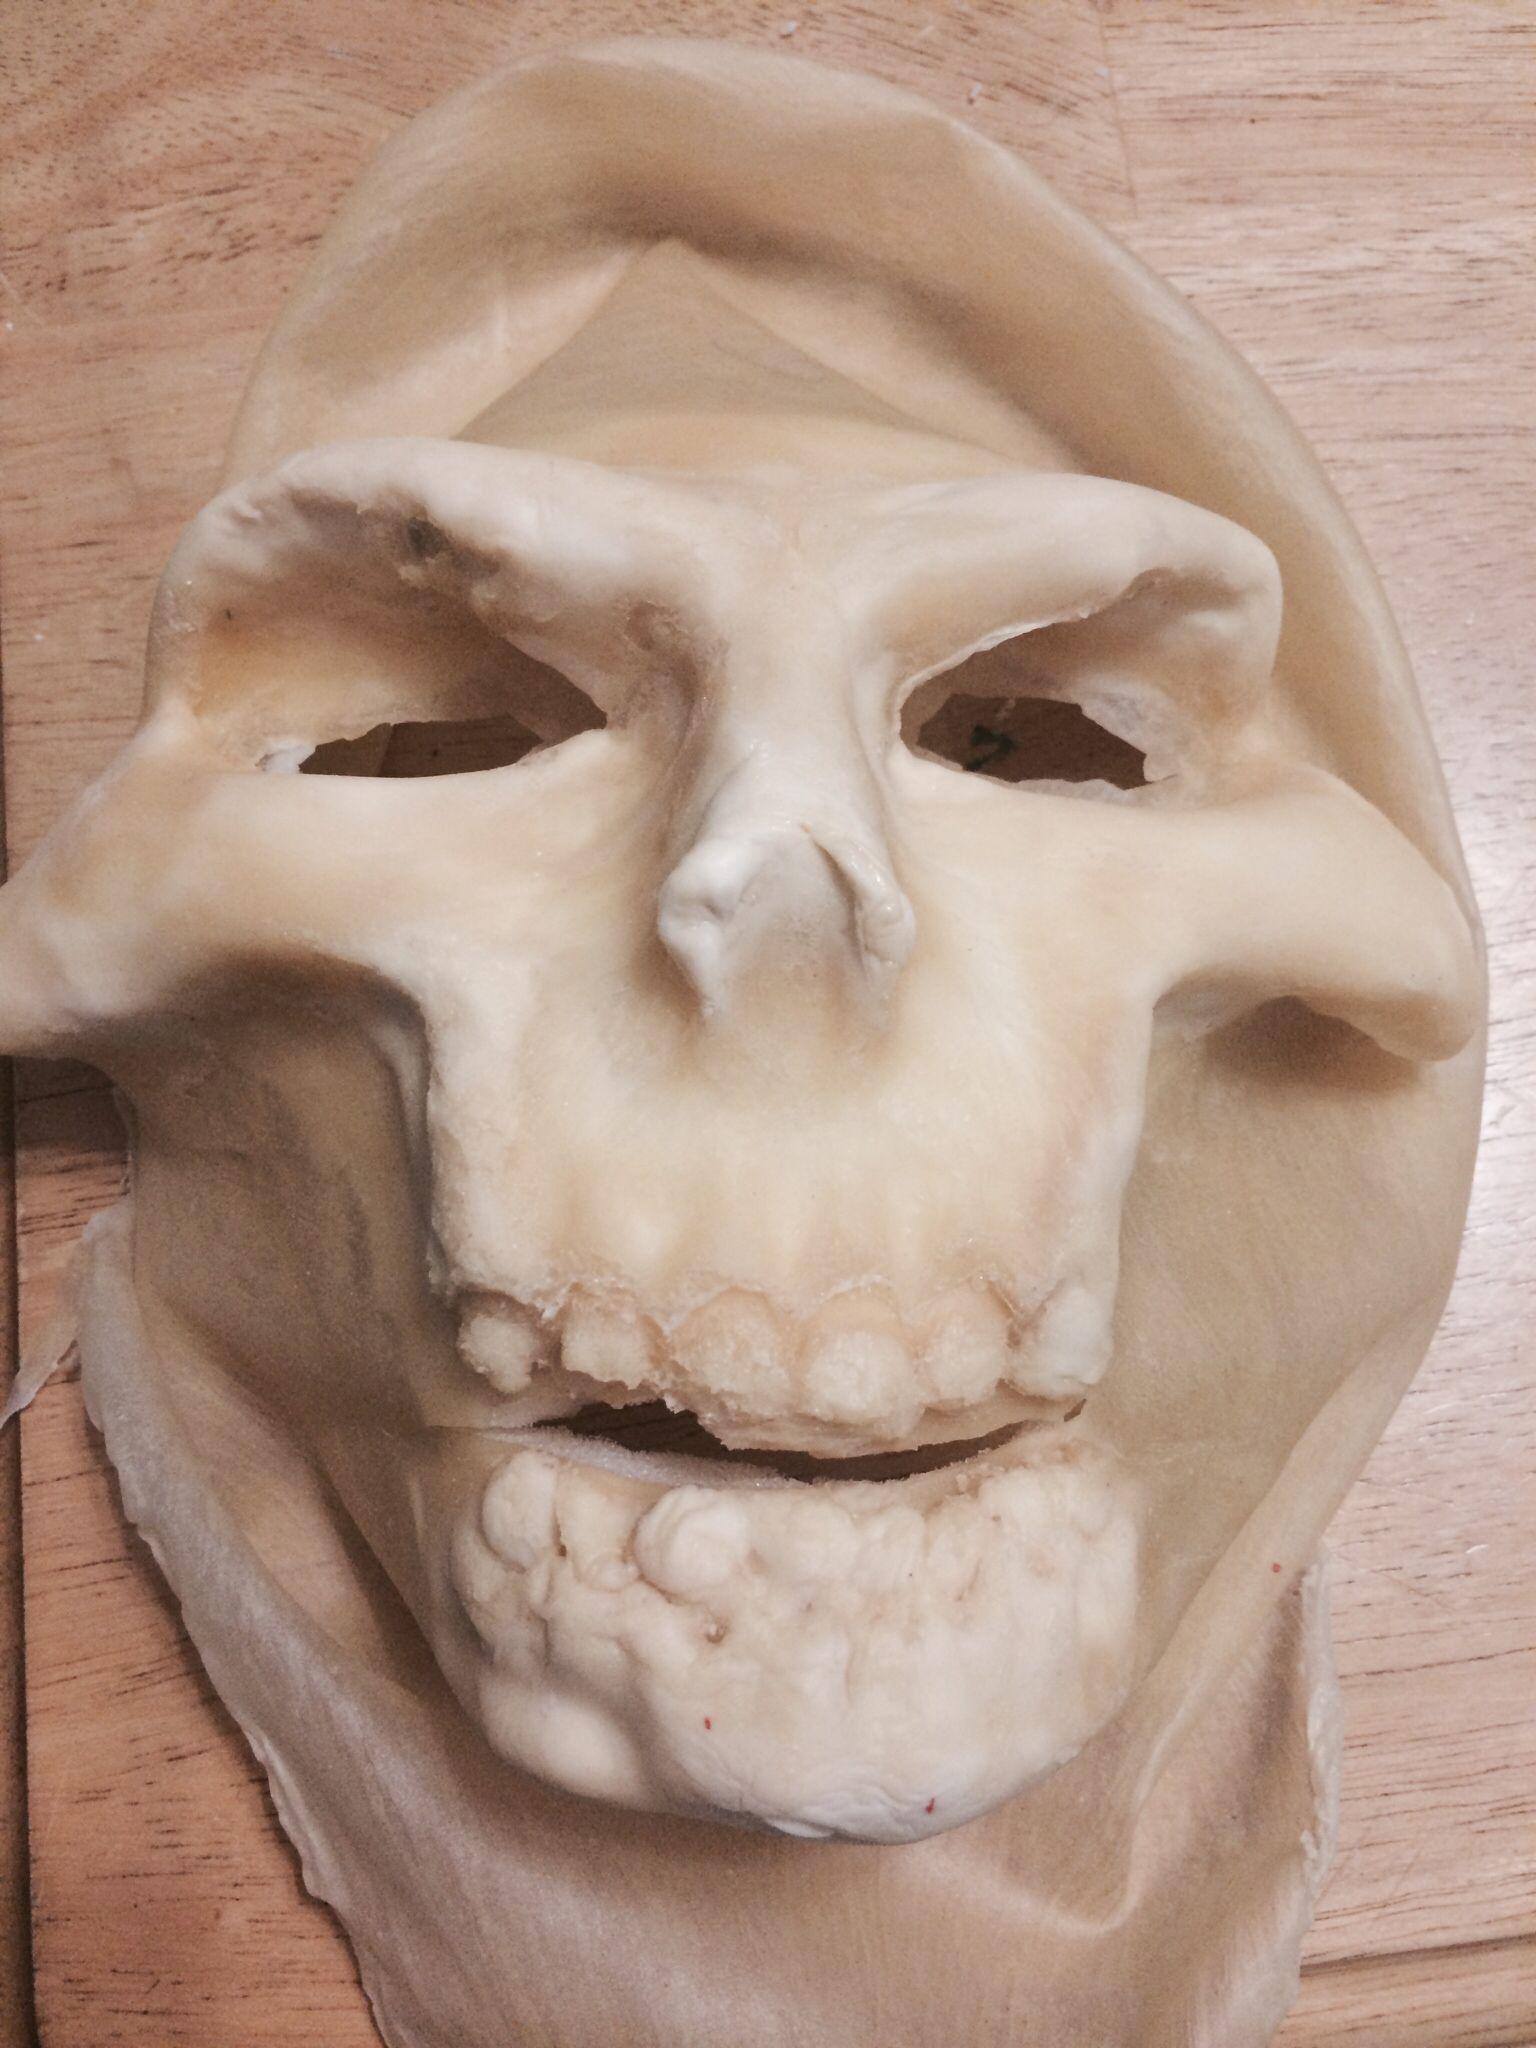 Airbrushing latex masks